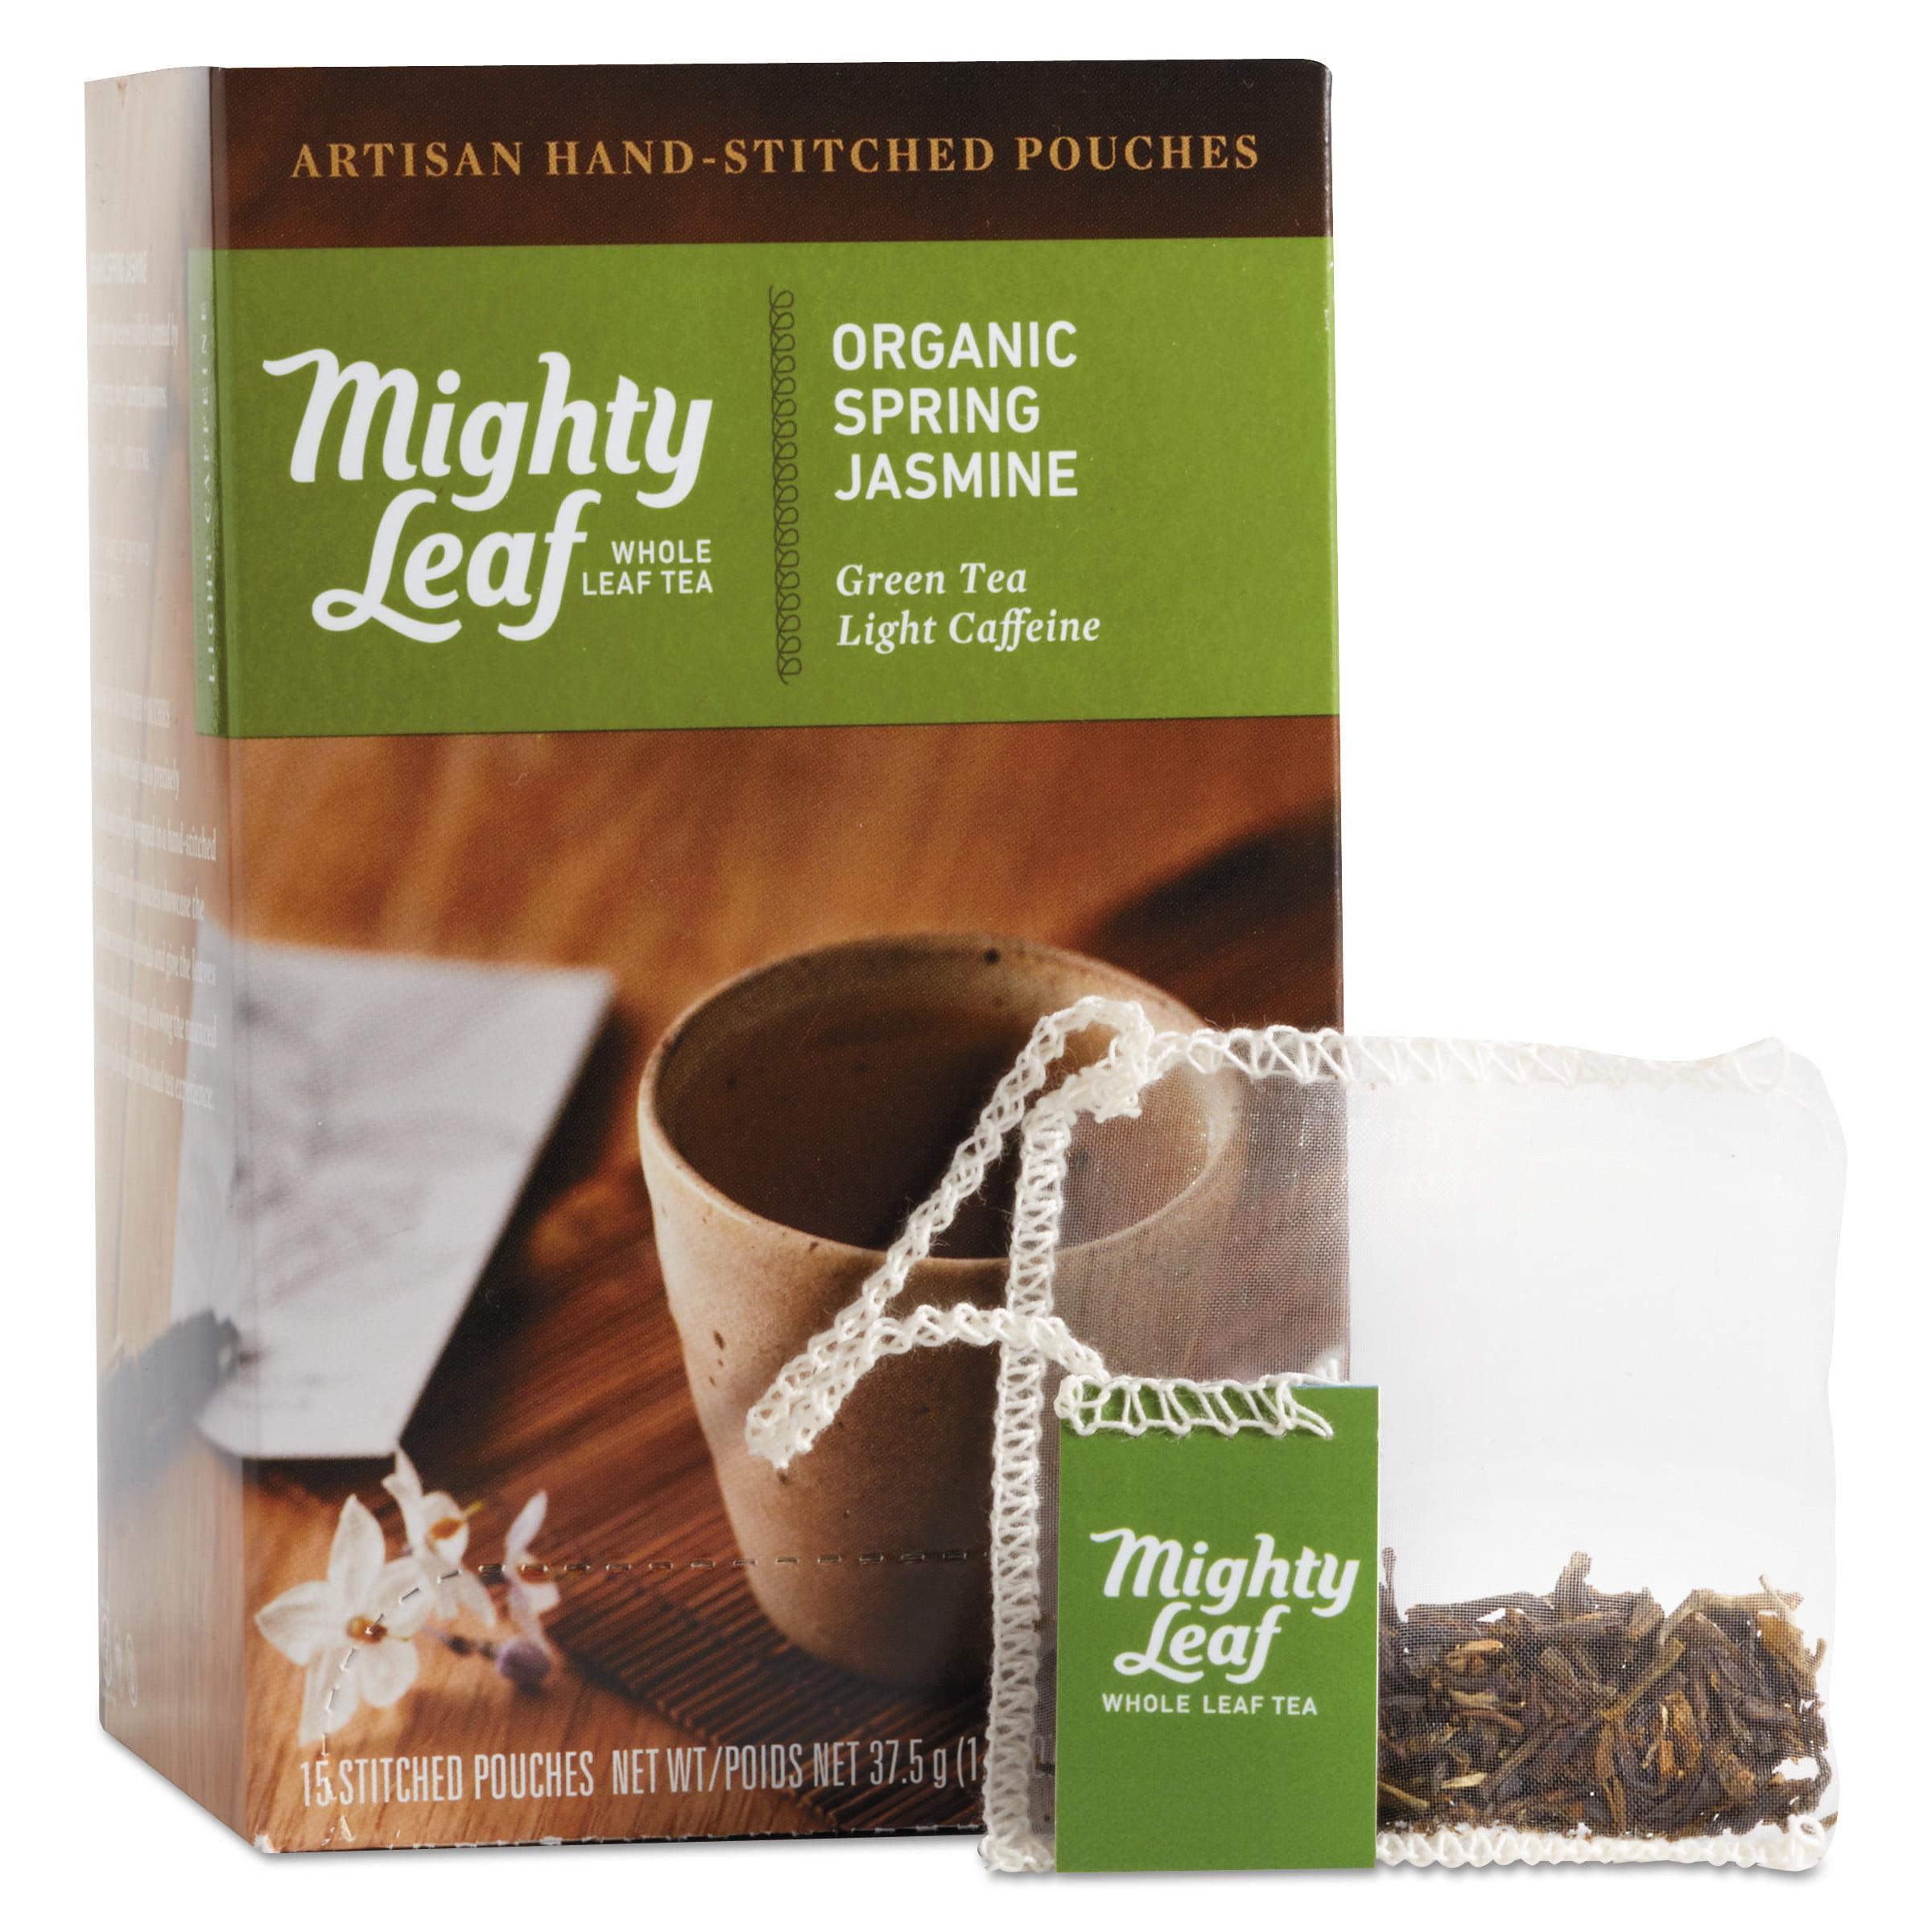 Mighty Leaf Tea Whole Leaf Tea Pouches, Organic Spring Jasmine, 15/Box